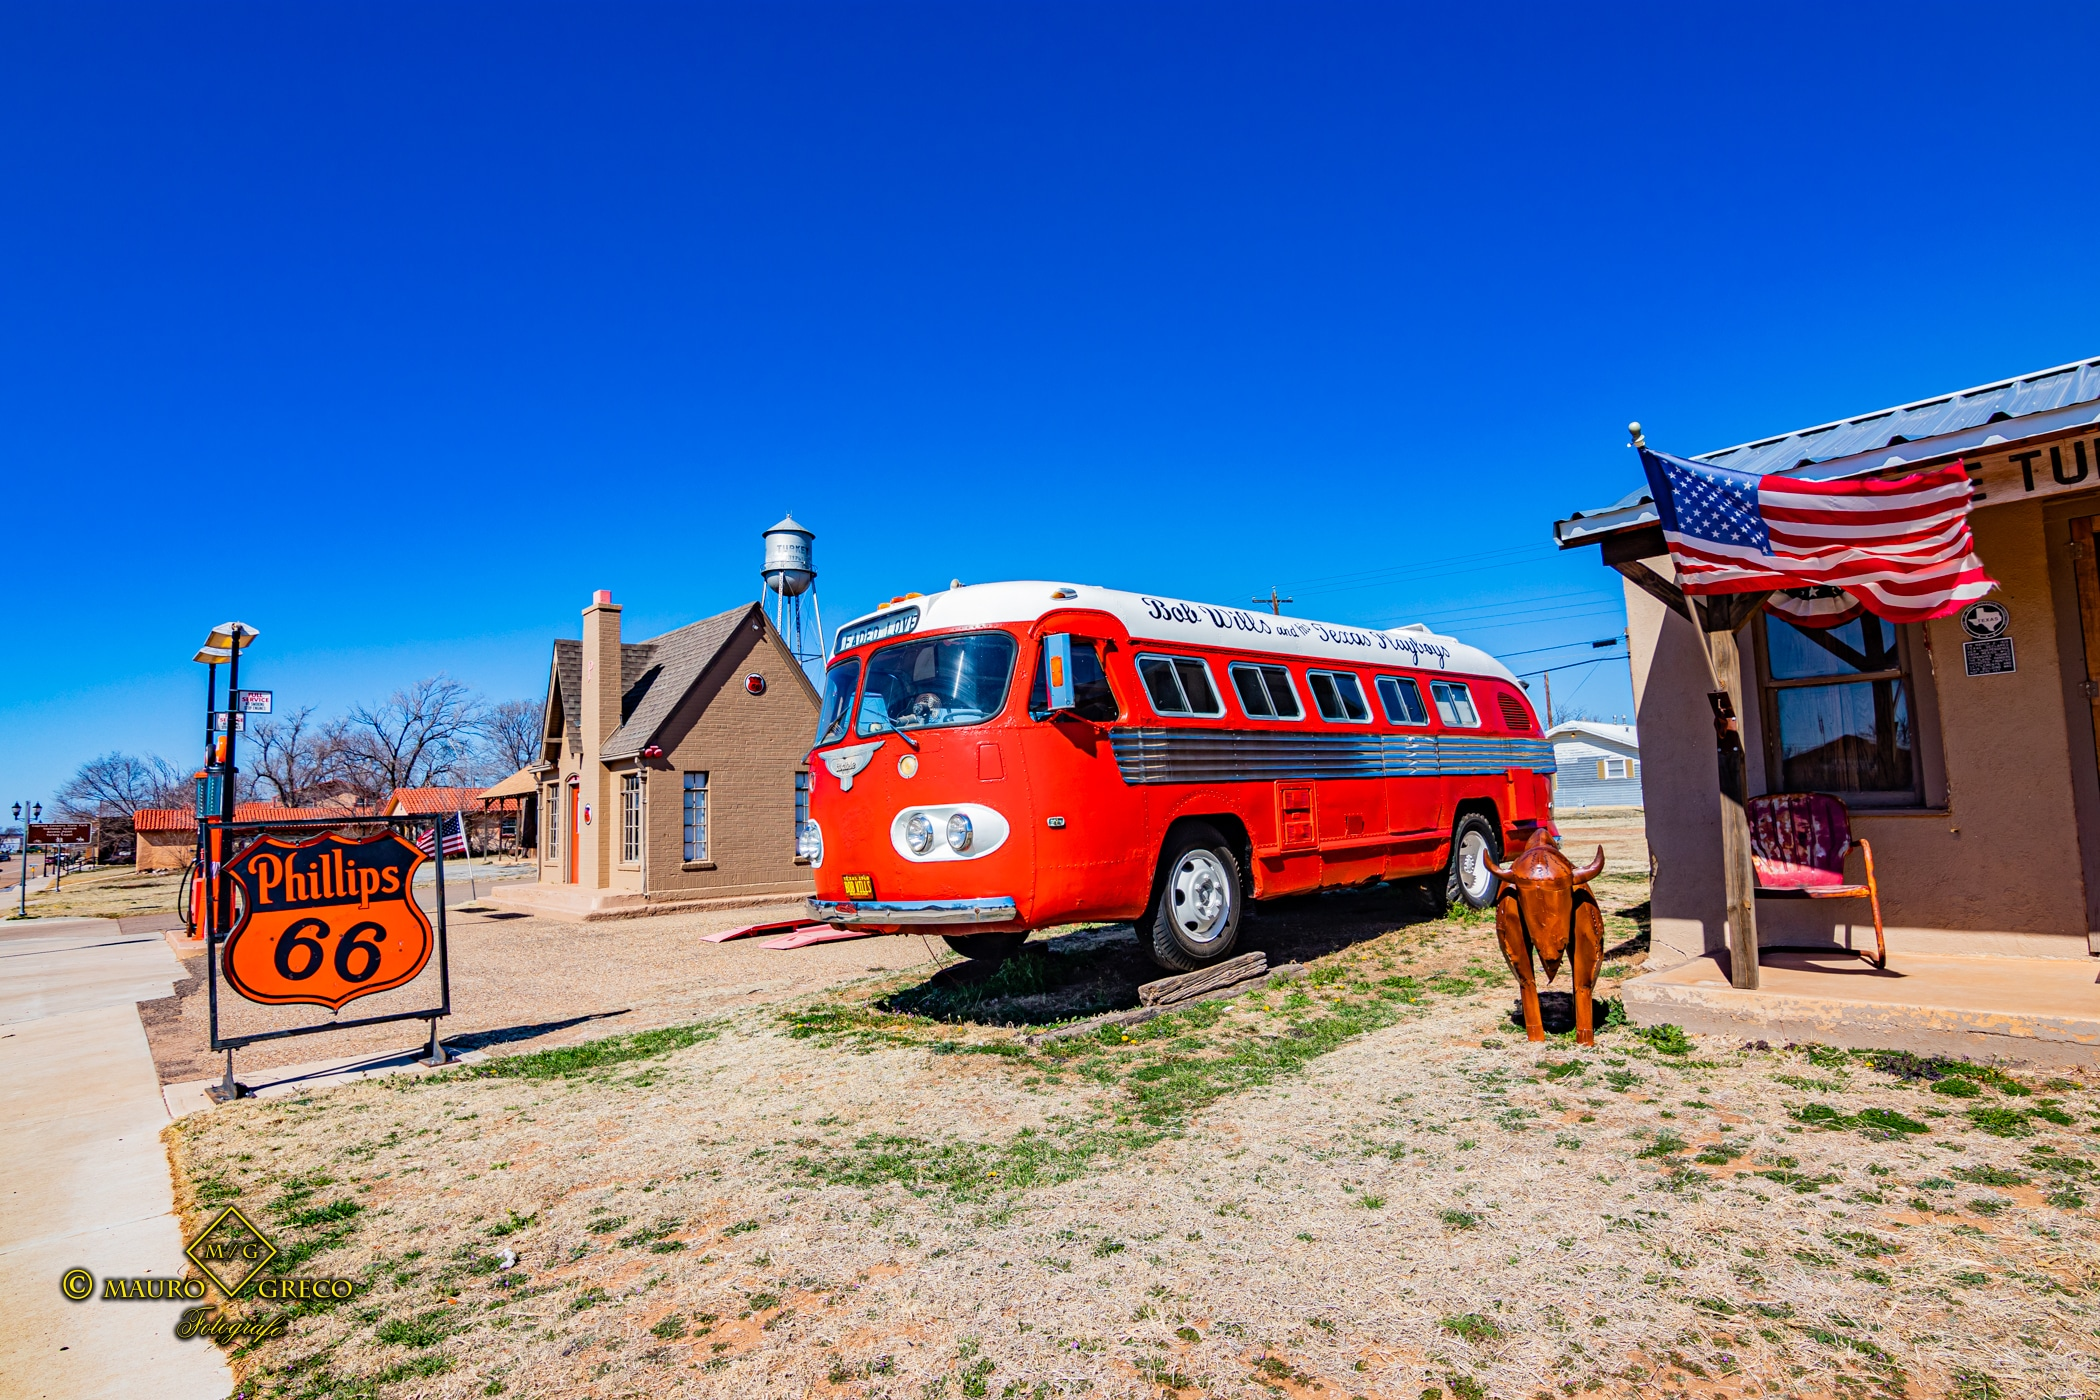 Turkey Texas 2020 Tornado Moto Tour Viaggi organizzati in moto negli USA Monument Valley